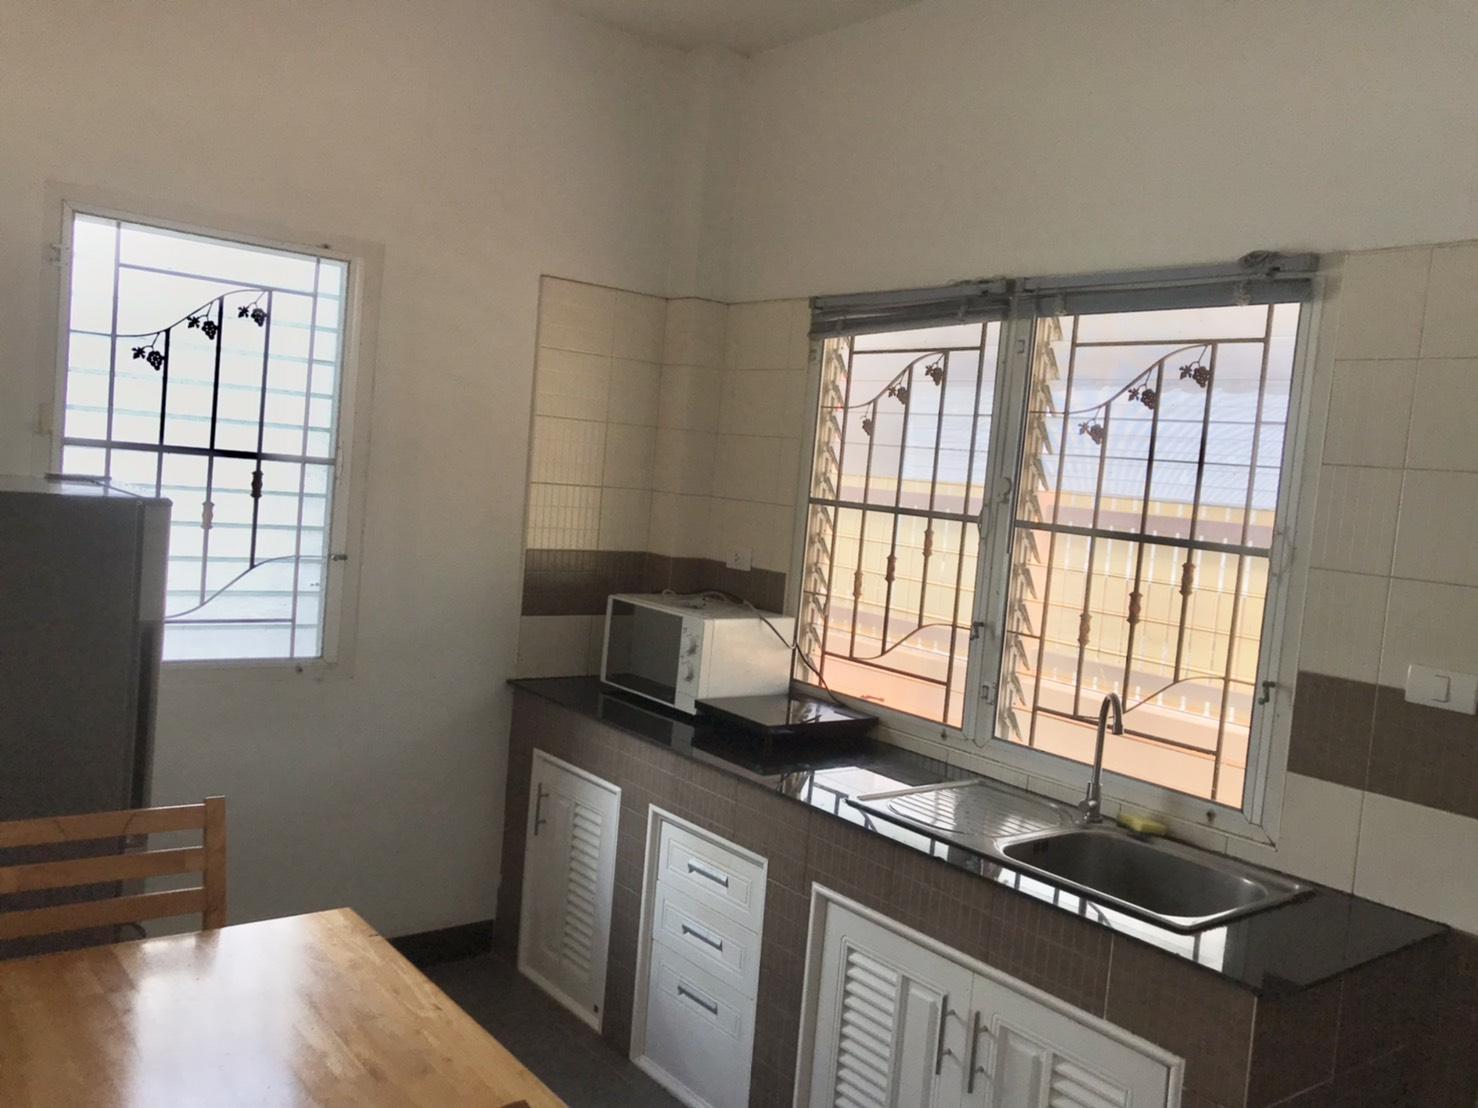 2 Bedroom house near Chalong Circle